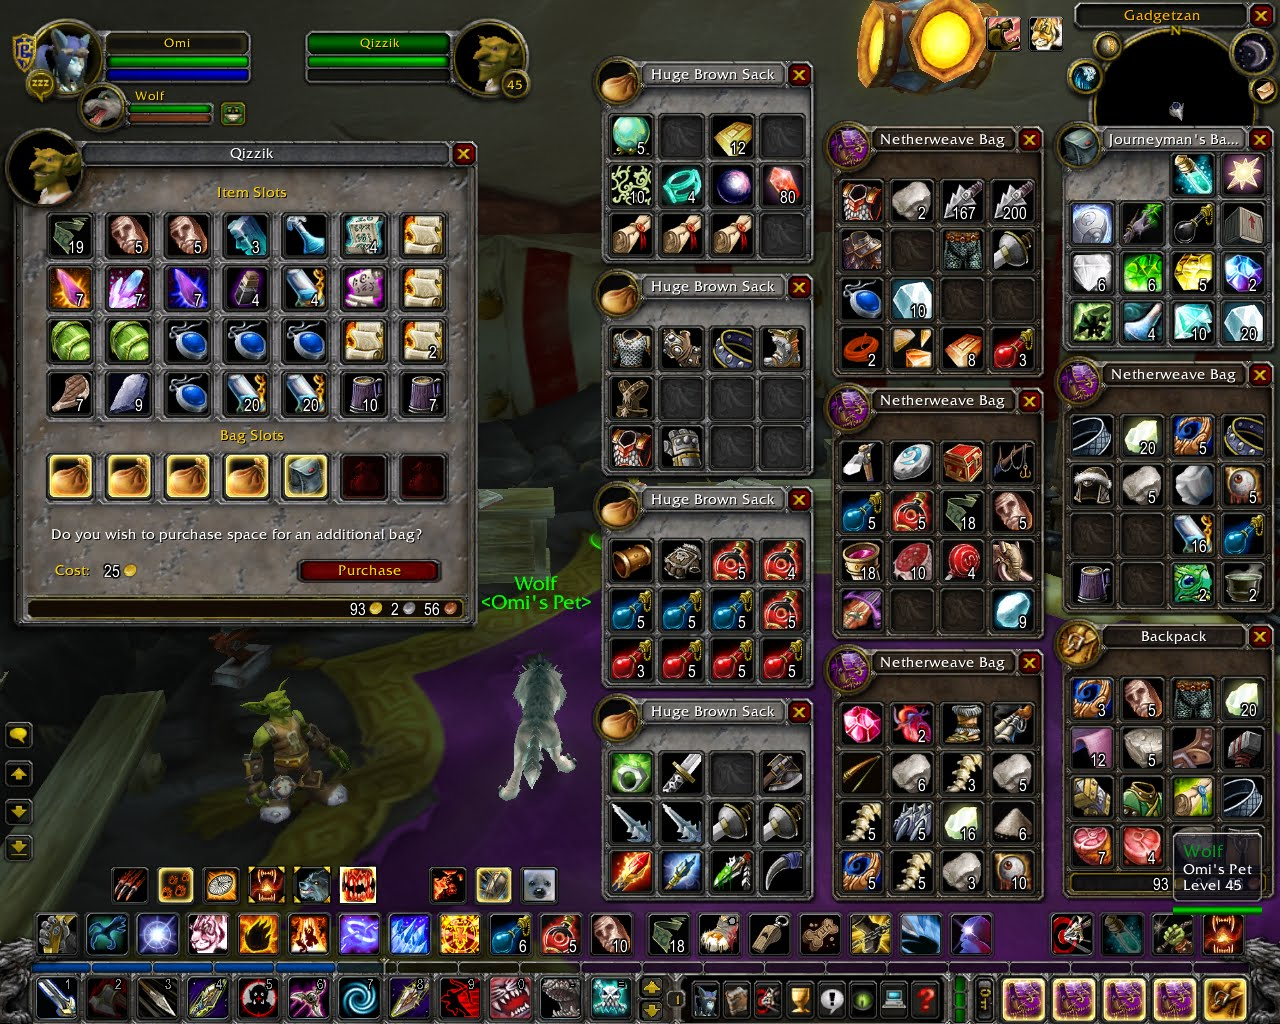 world of warcraft inventory storage screenshot the best games ever